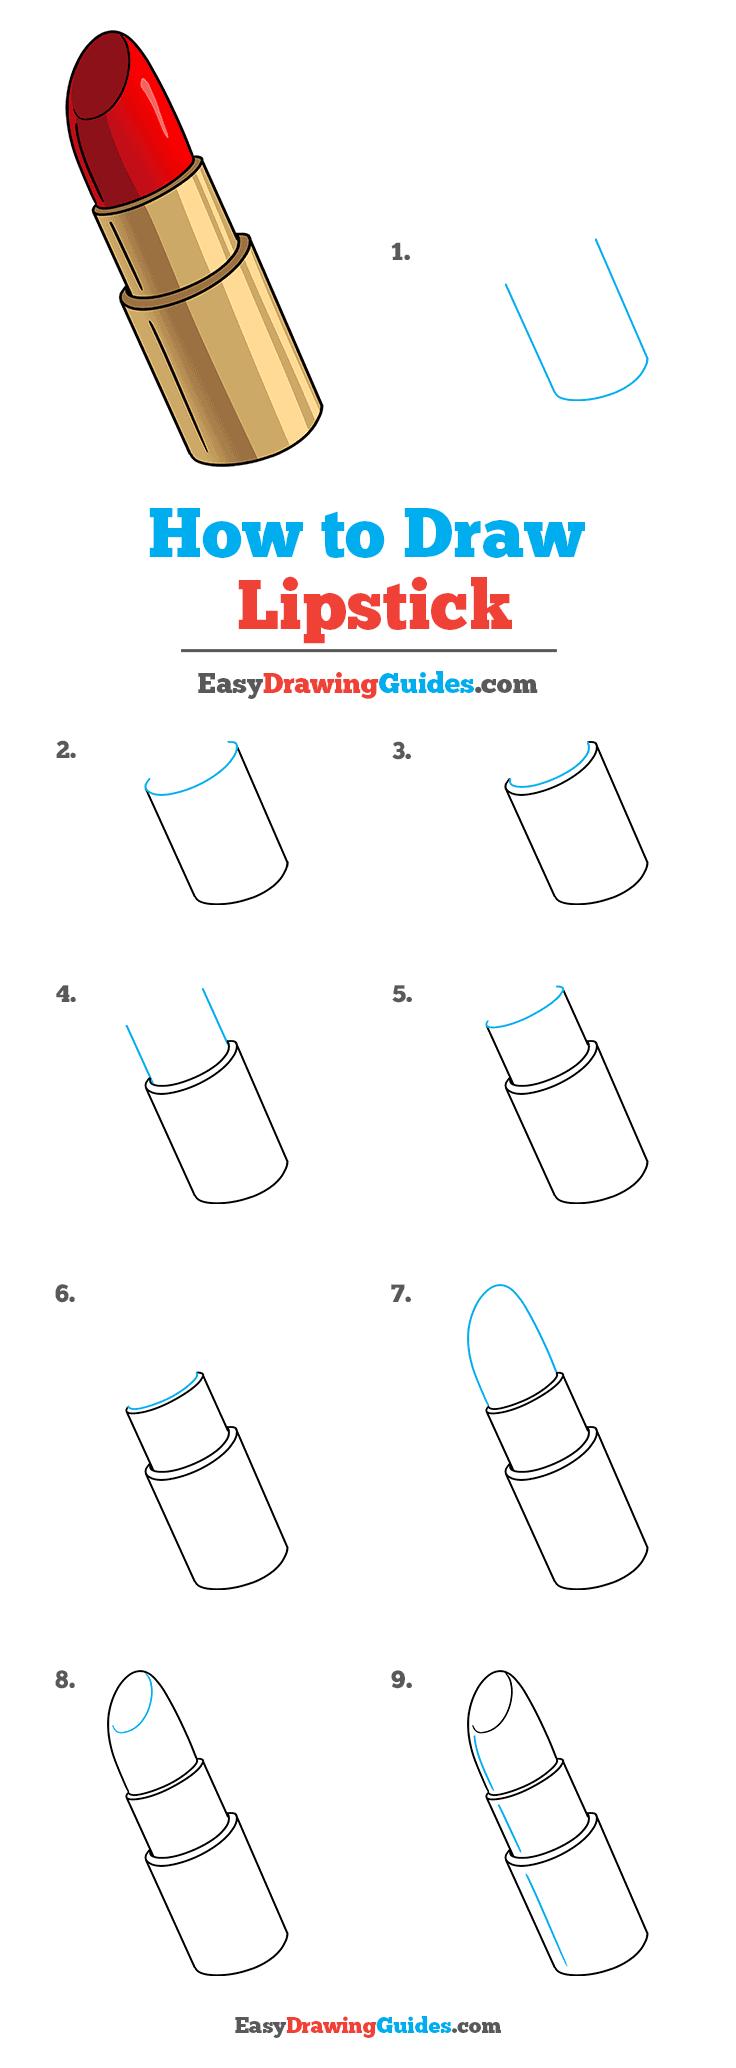 How to Draw Lipstick